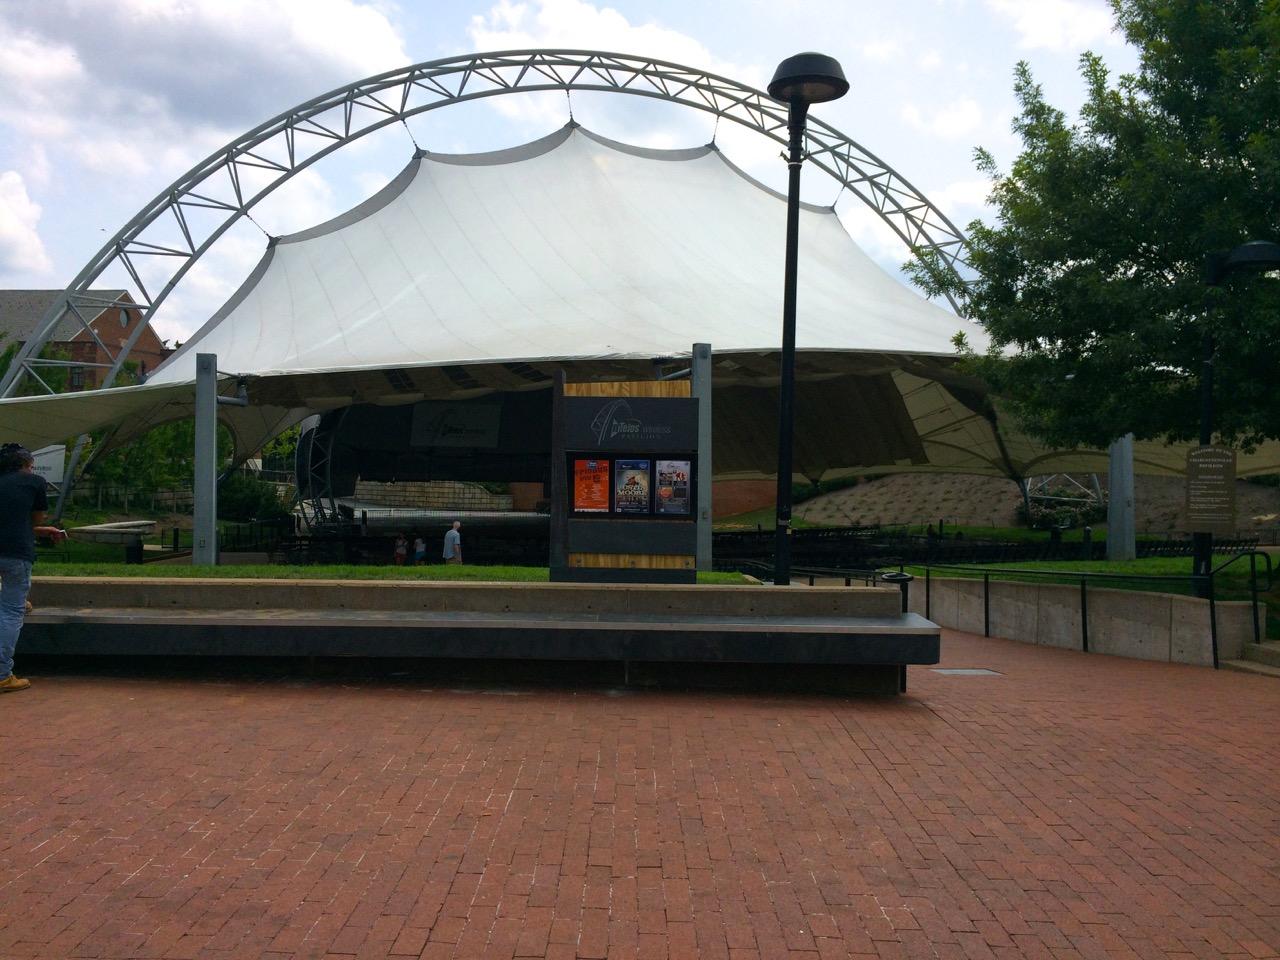 Charlottesville-VA-downtown-IthacaBuilds-08091417